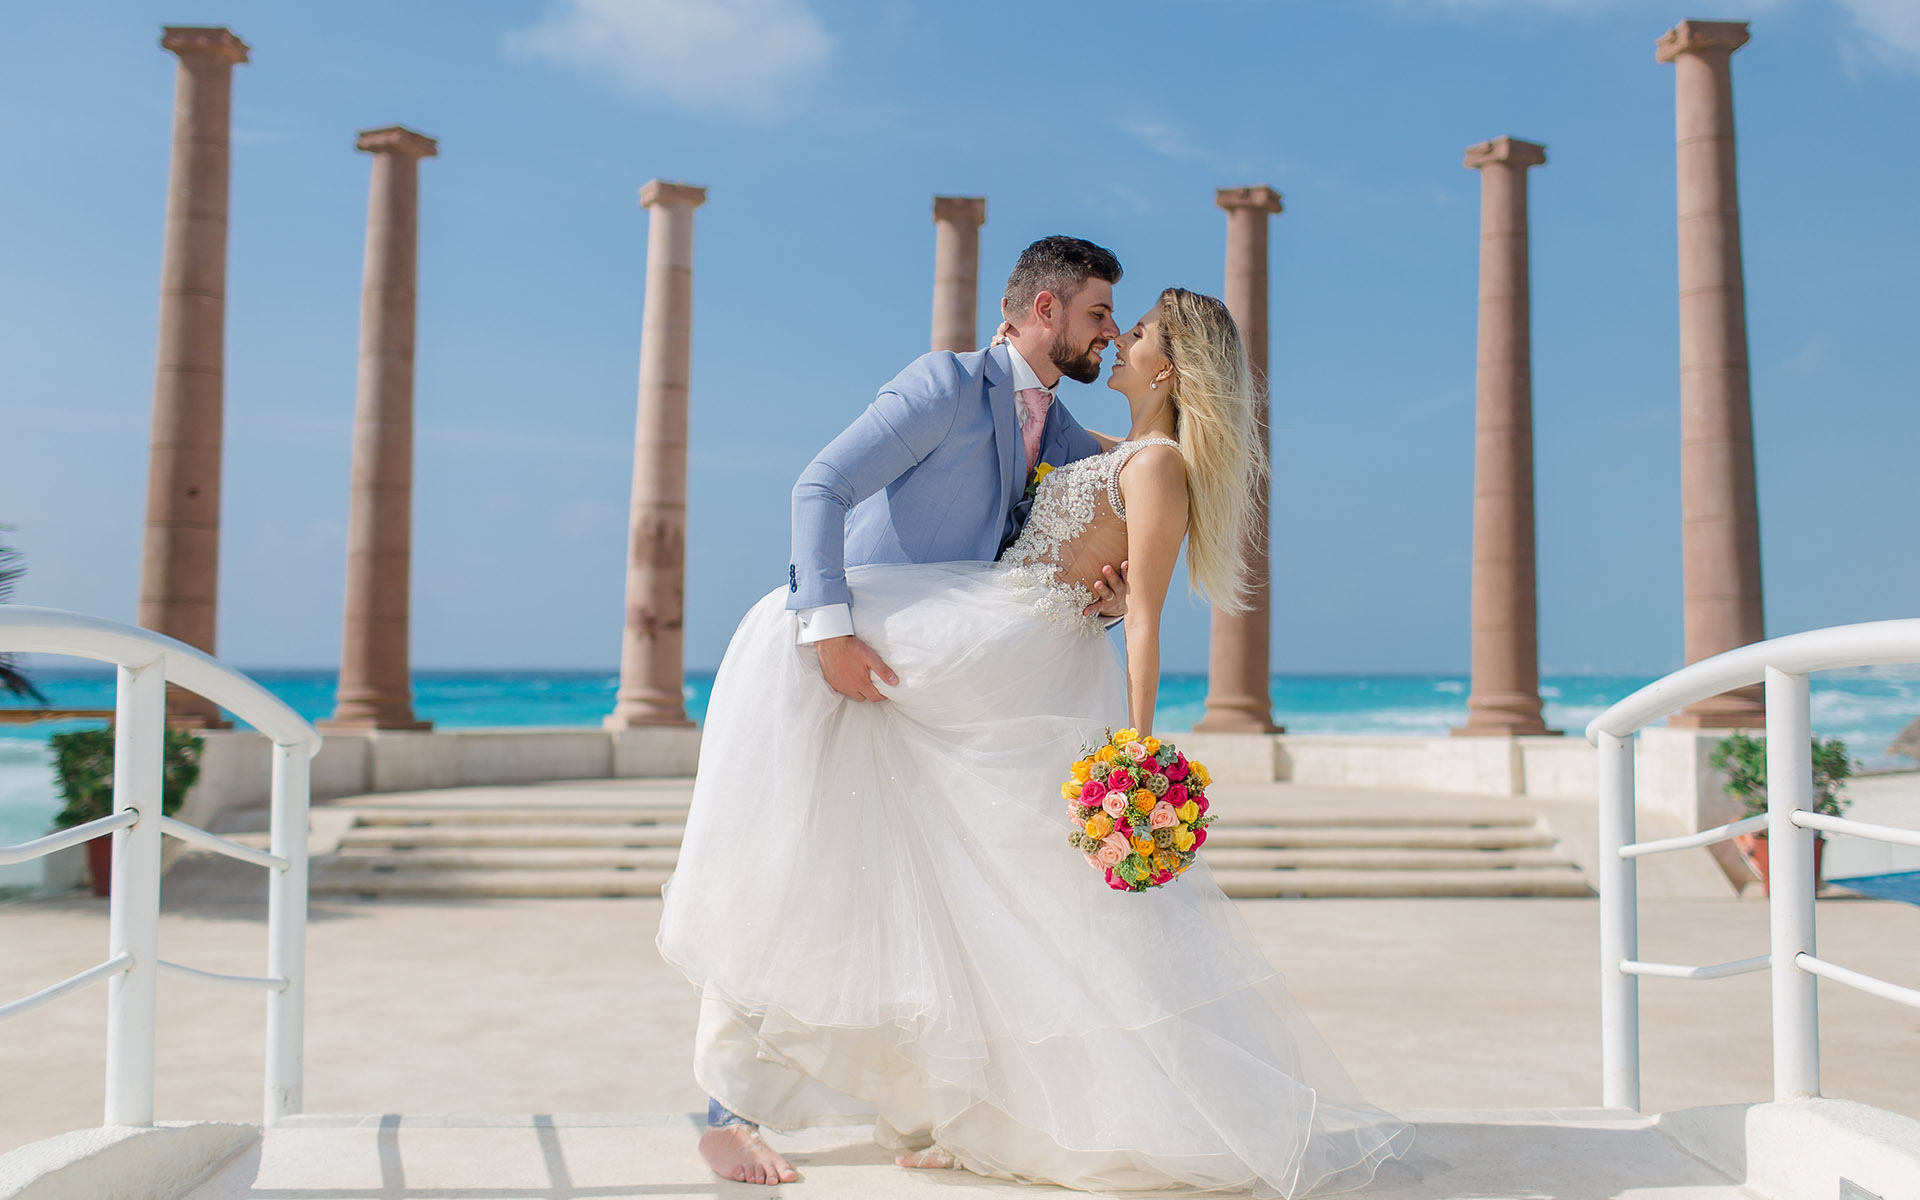 Wedding Photographer for Cancun and Riviera MAya